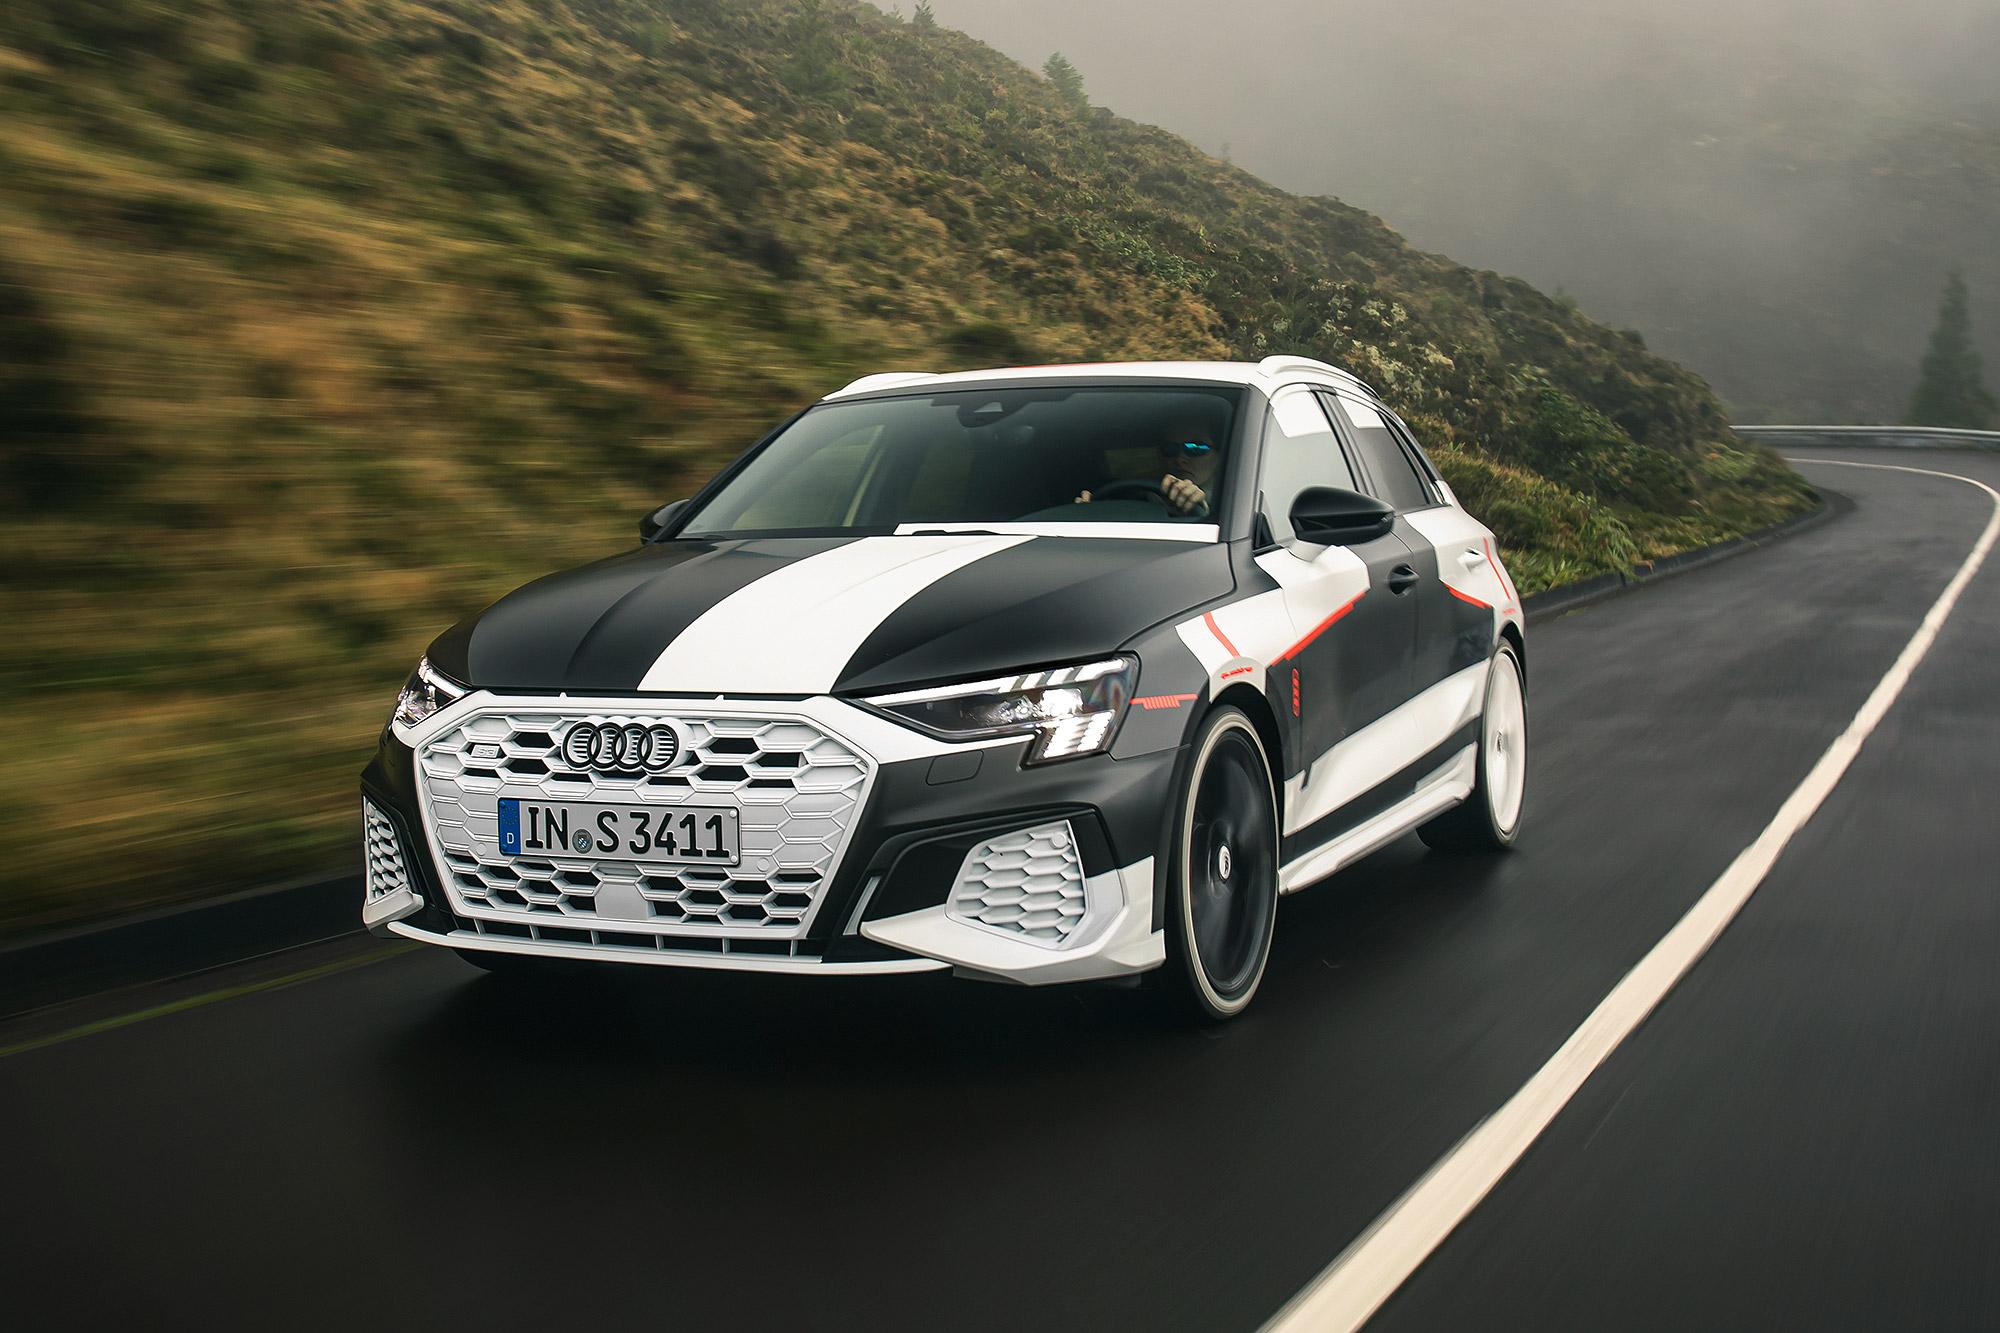 Audi 透過 S3 Sportback 的偽裝測試照片預告 A3 Sportback 即將發表大改款更新。